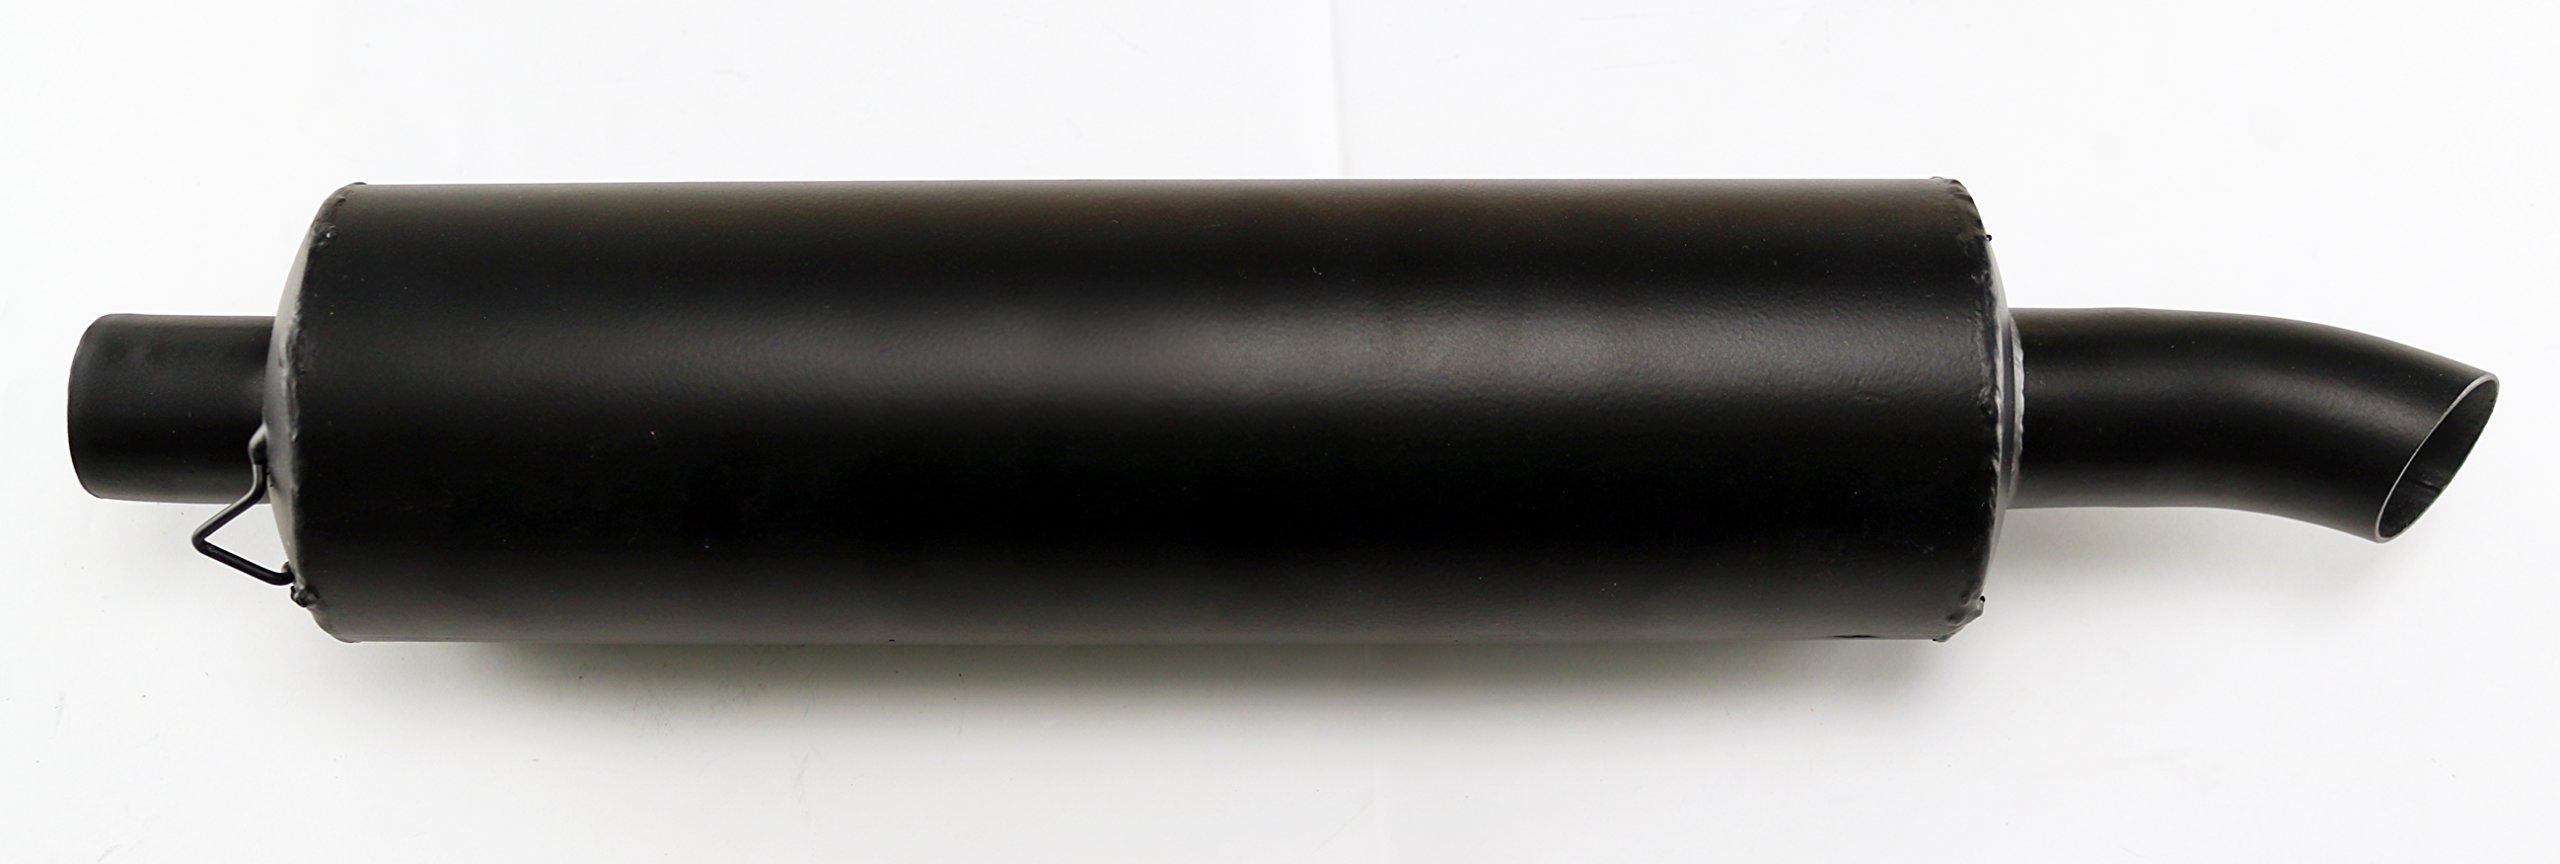 Universal Exhaust Muffler Pipe For Dirt/Street Bike, Scooter, ATV, Quad, 64-499